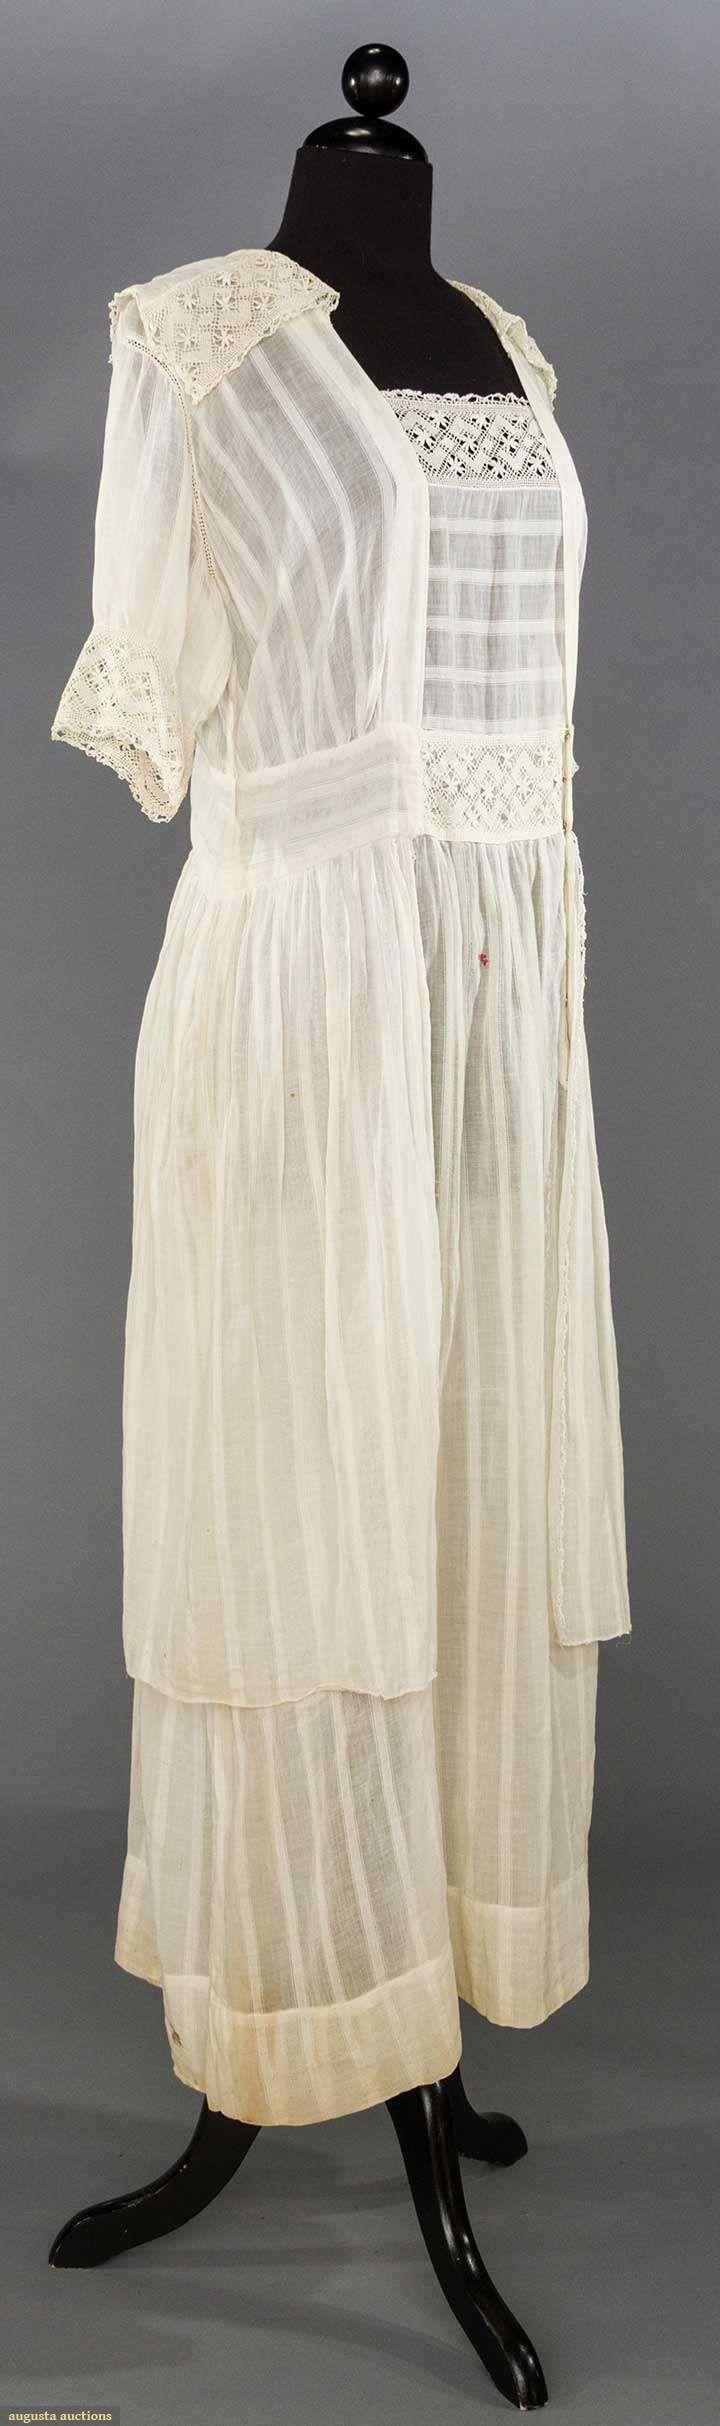 WHITE DAY DRESS, 1915-1918  May 9, 2017 - CATALOG SALE Sturbridge, Massachusetts